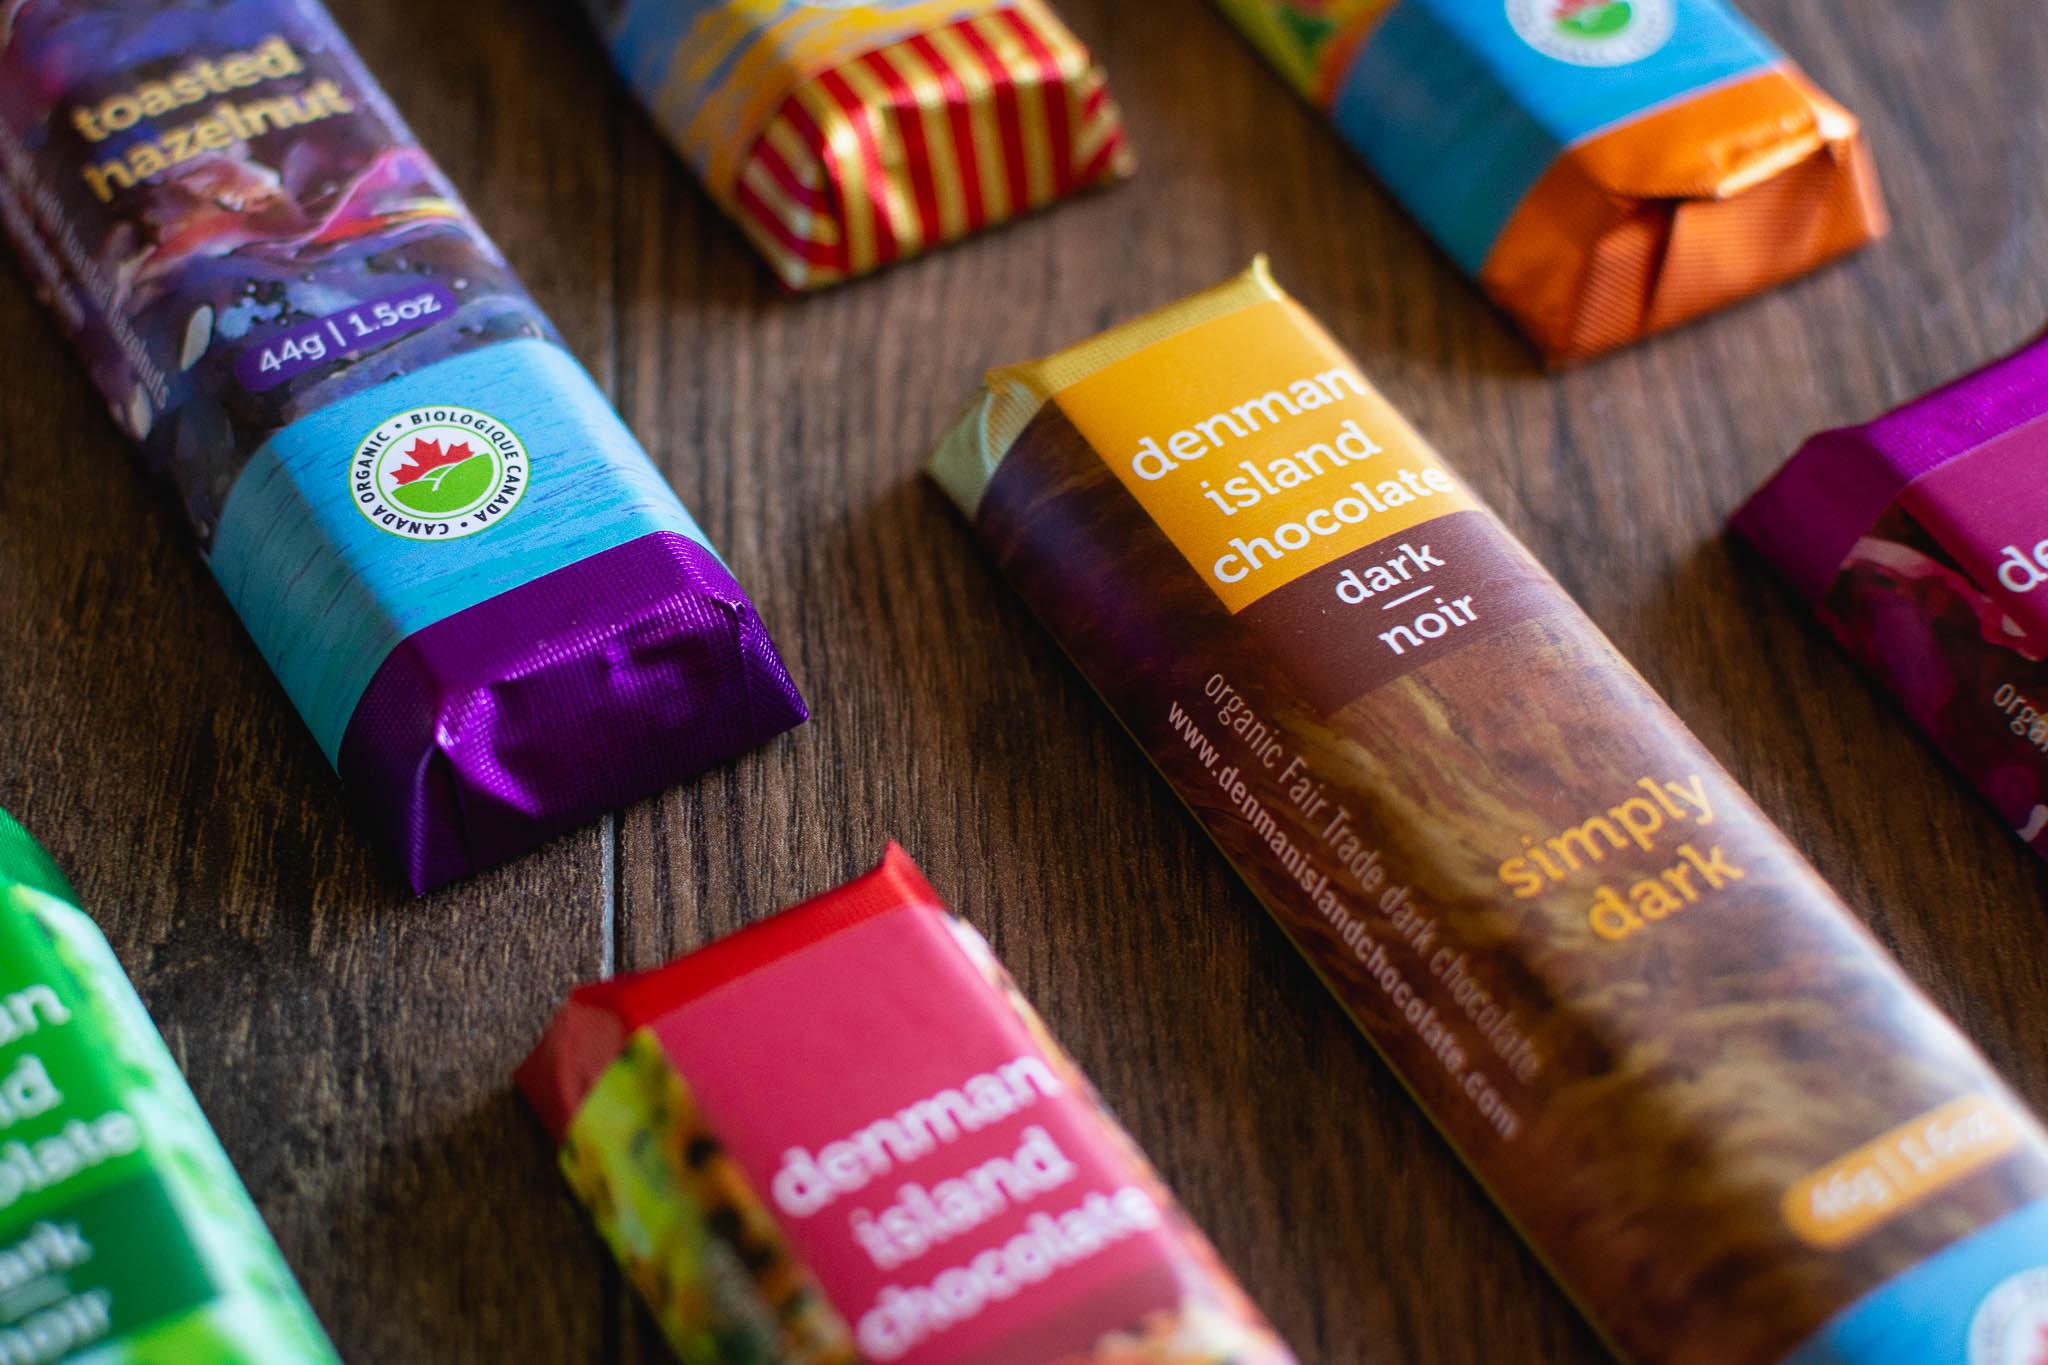 Simply Dark Chocolate Bar by Denman Island Chocolate